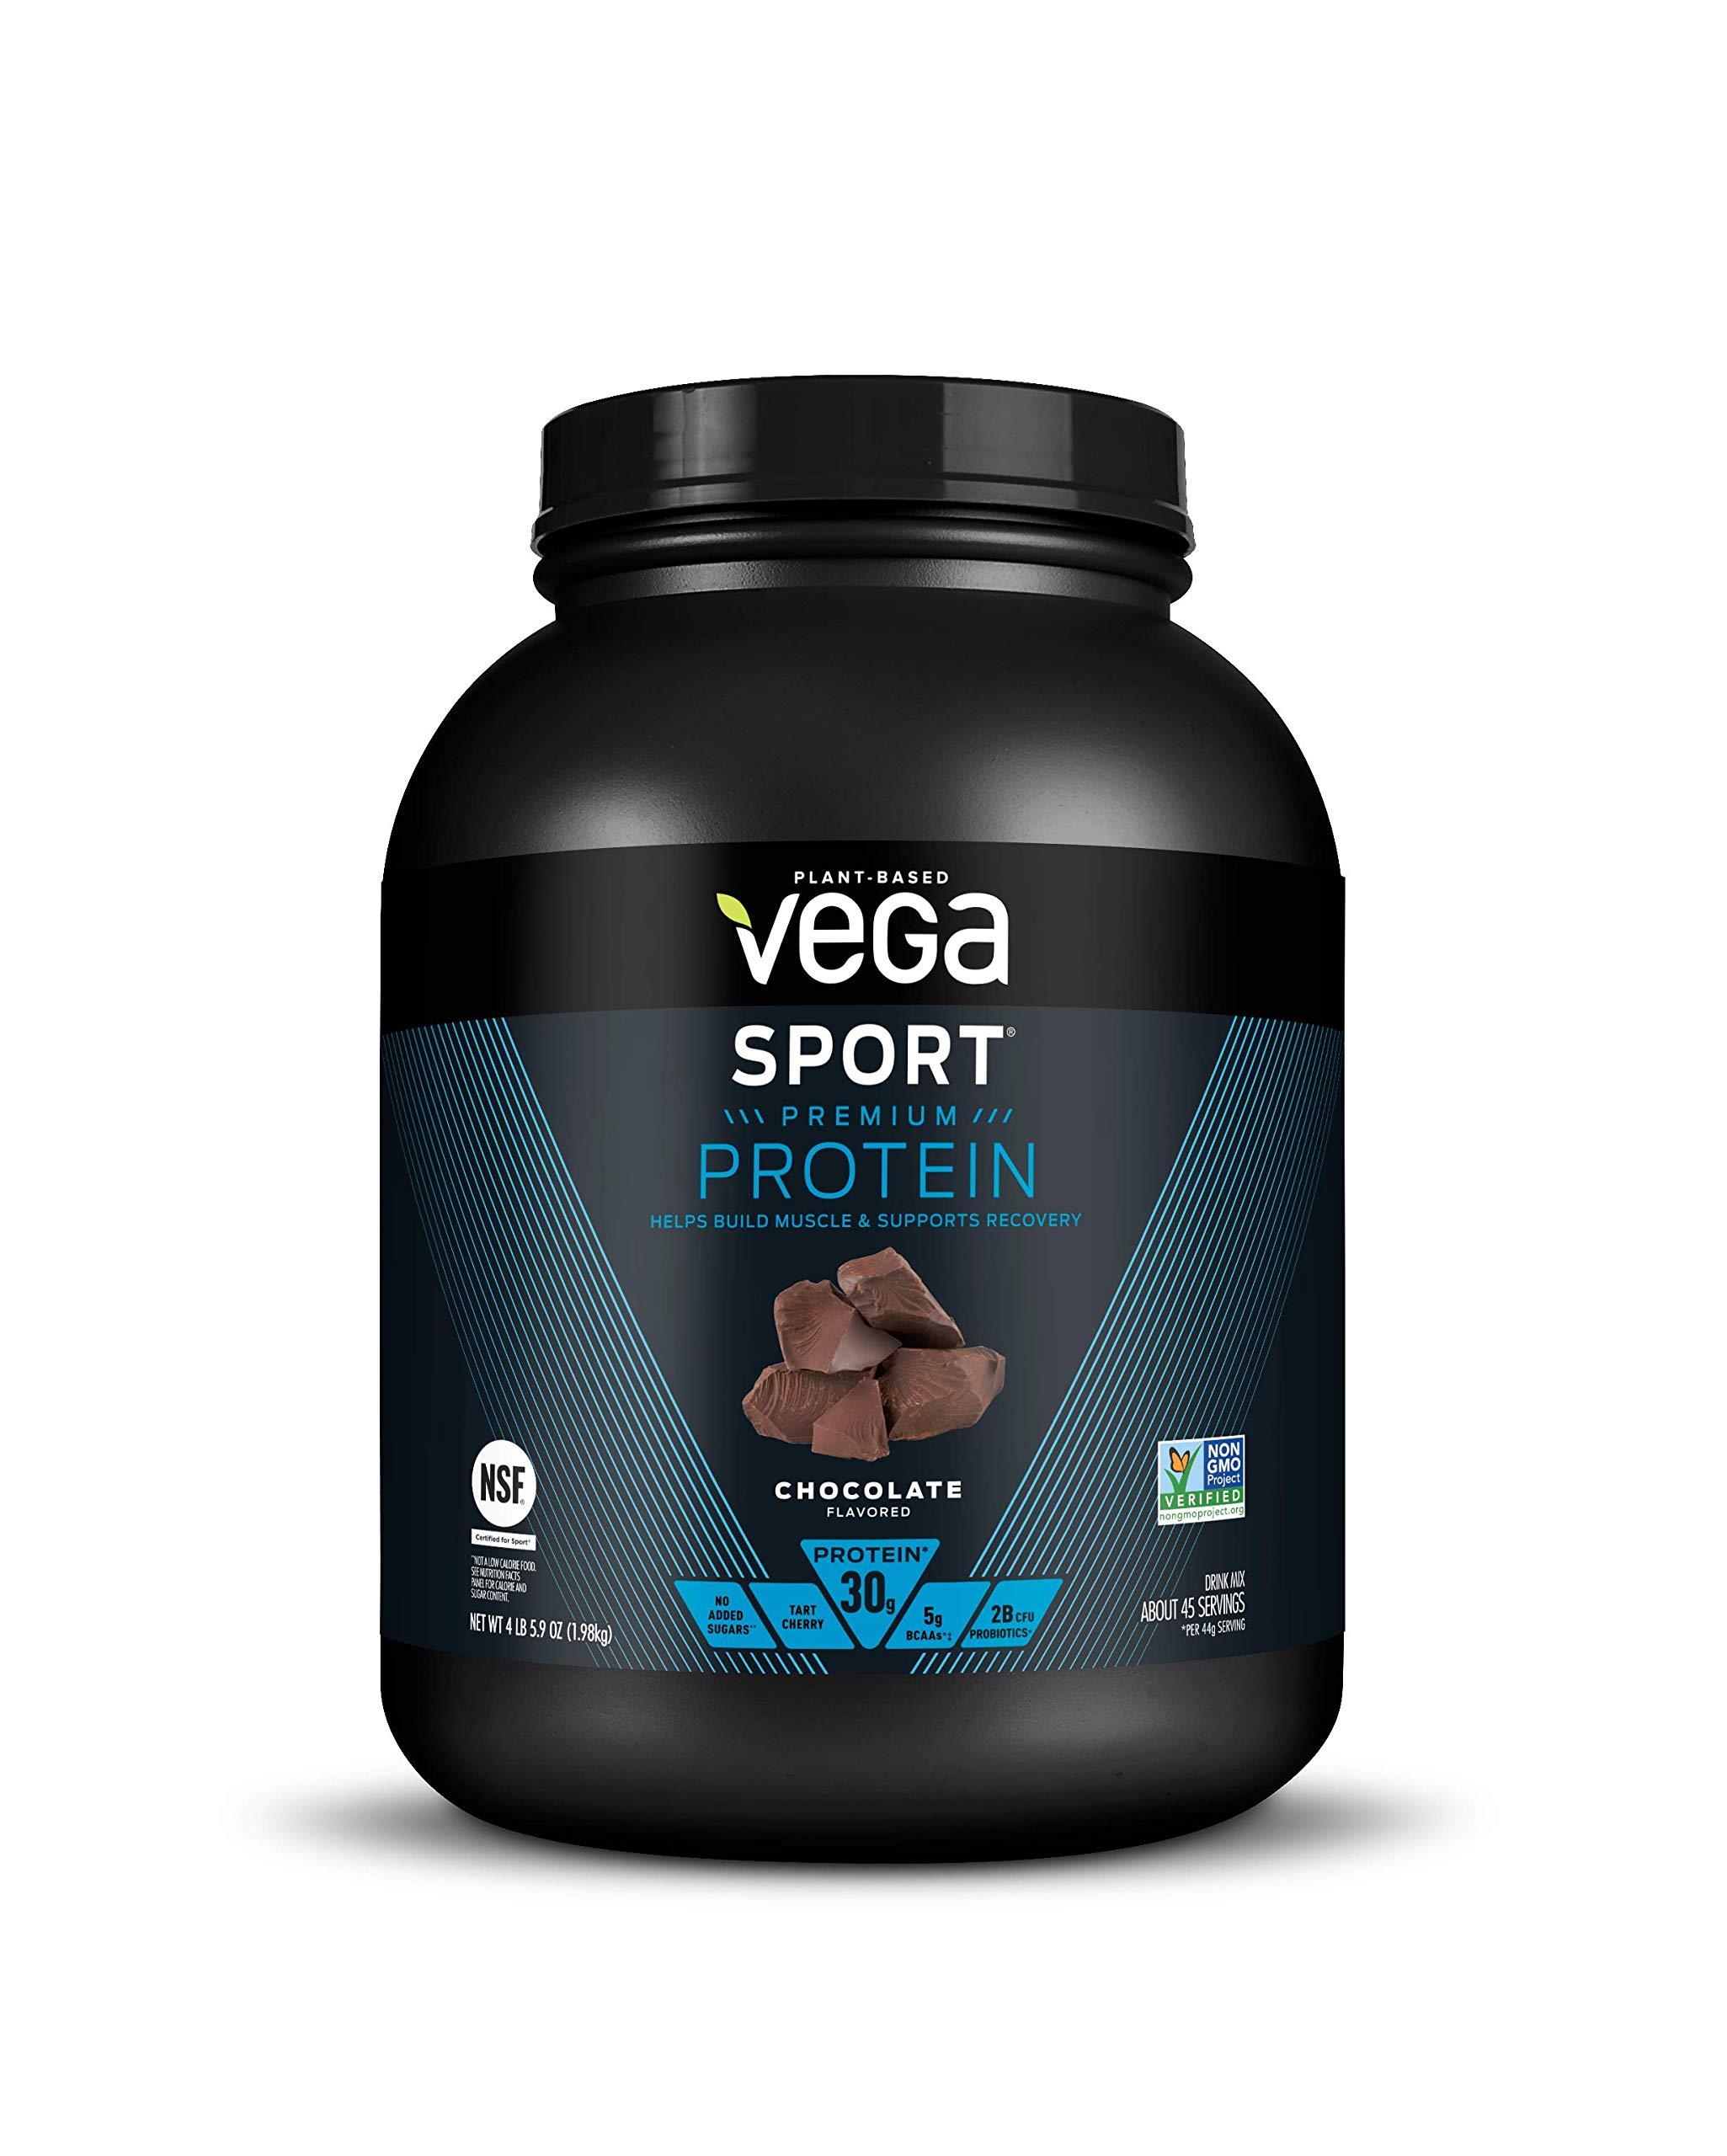 Vega Sport Protein Powder Chocolate (45 Servings, 69.9 Ounce) - Plant Based Vegan Protein Powder, BCAAs, Amino Acid, Tart Cherry, Non Dairy, Keto-Friendly, Gluten Free,  Non GMO (Packaging May Vary) by VEGA